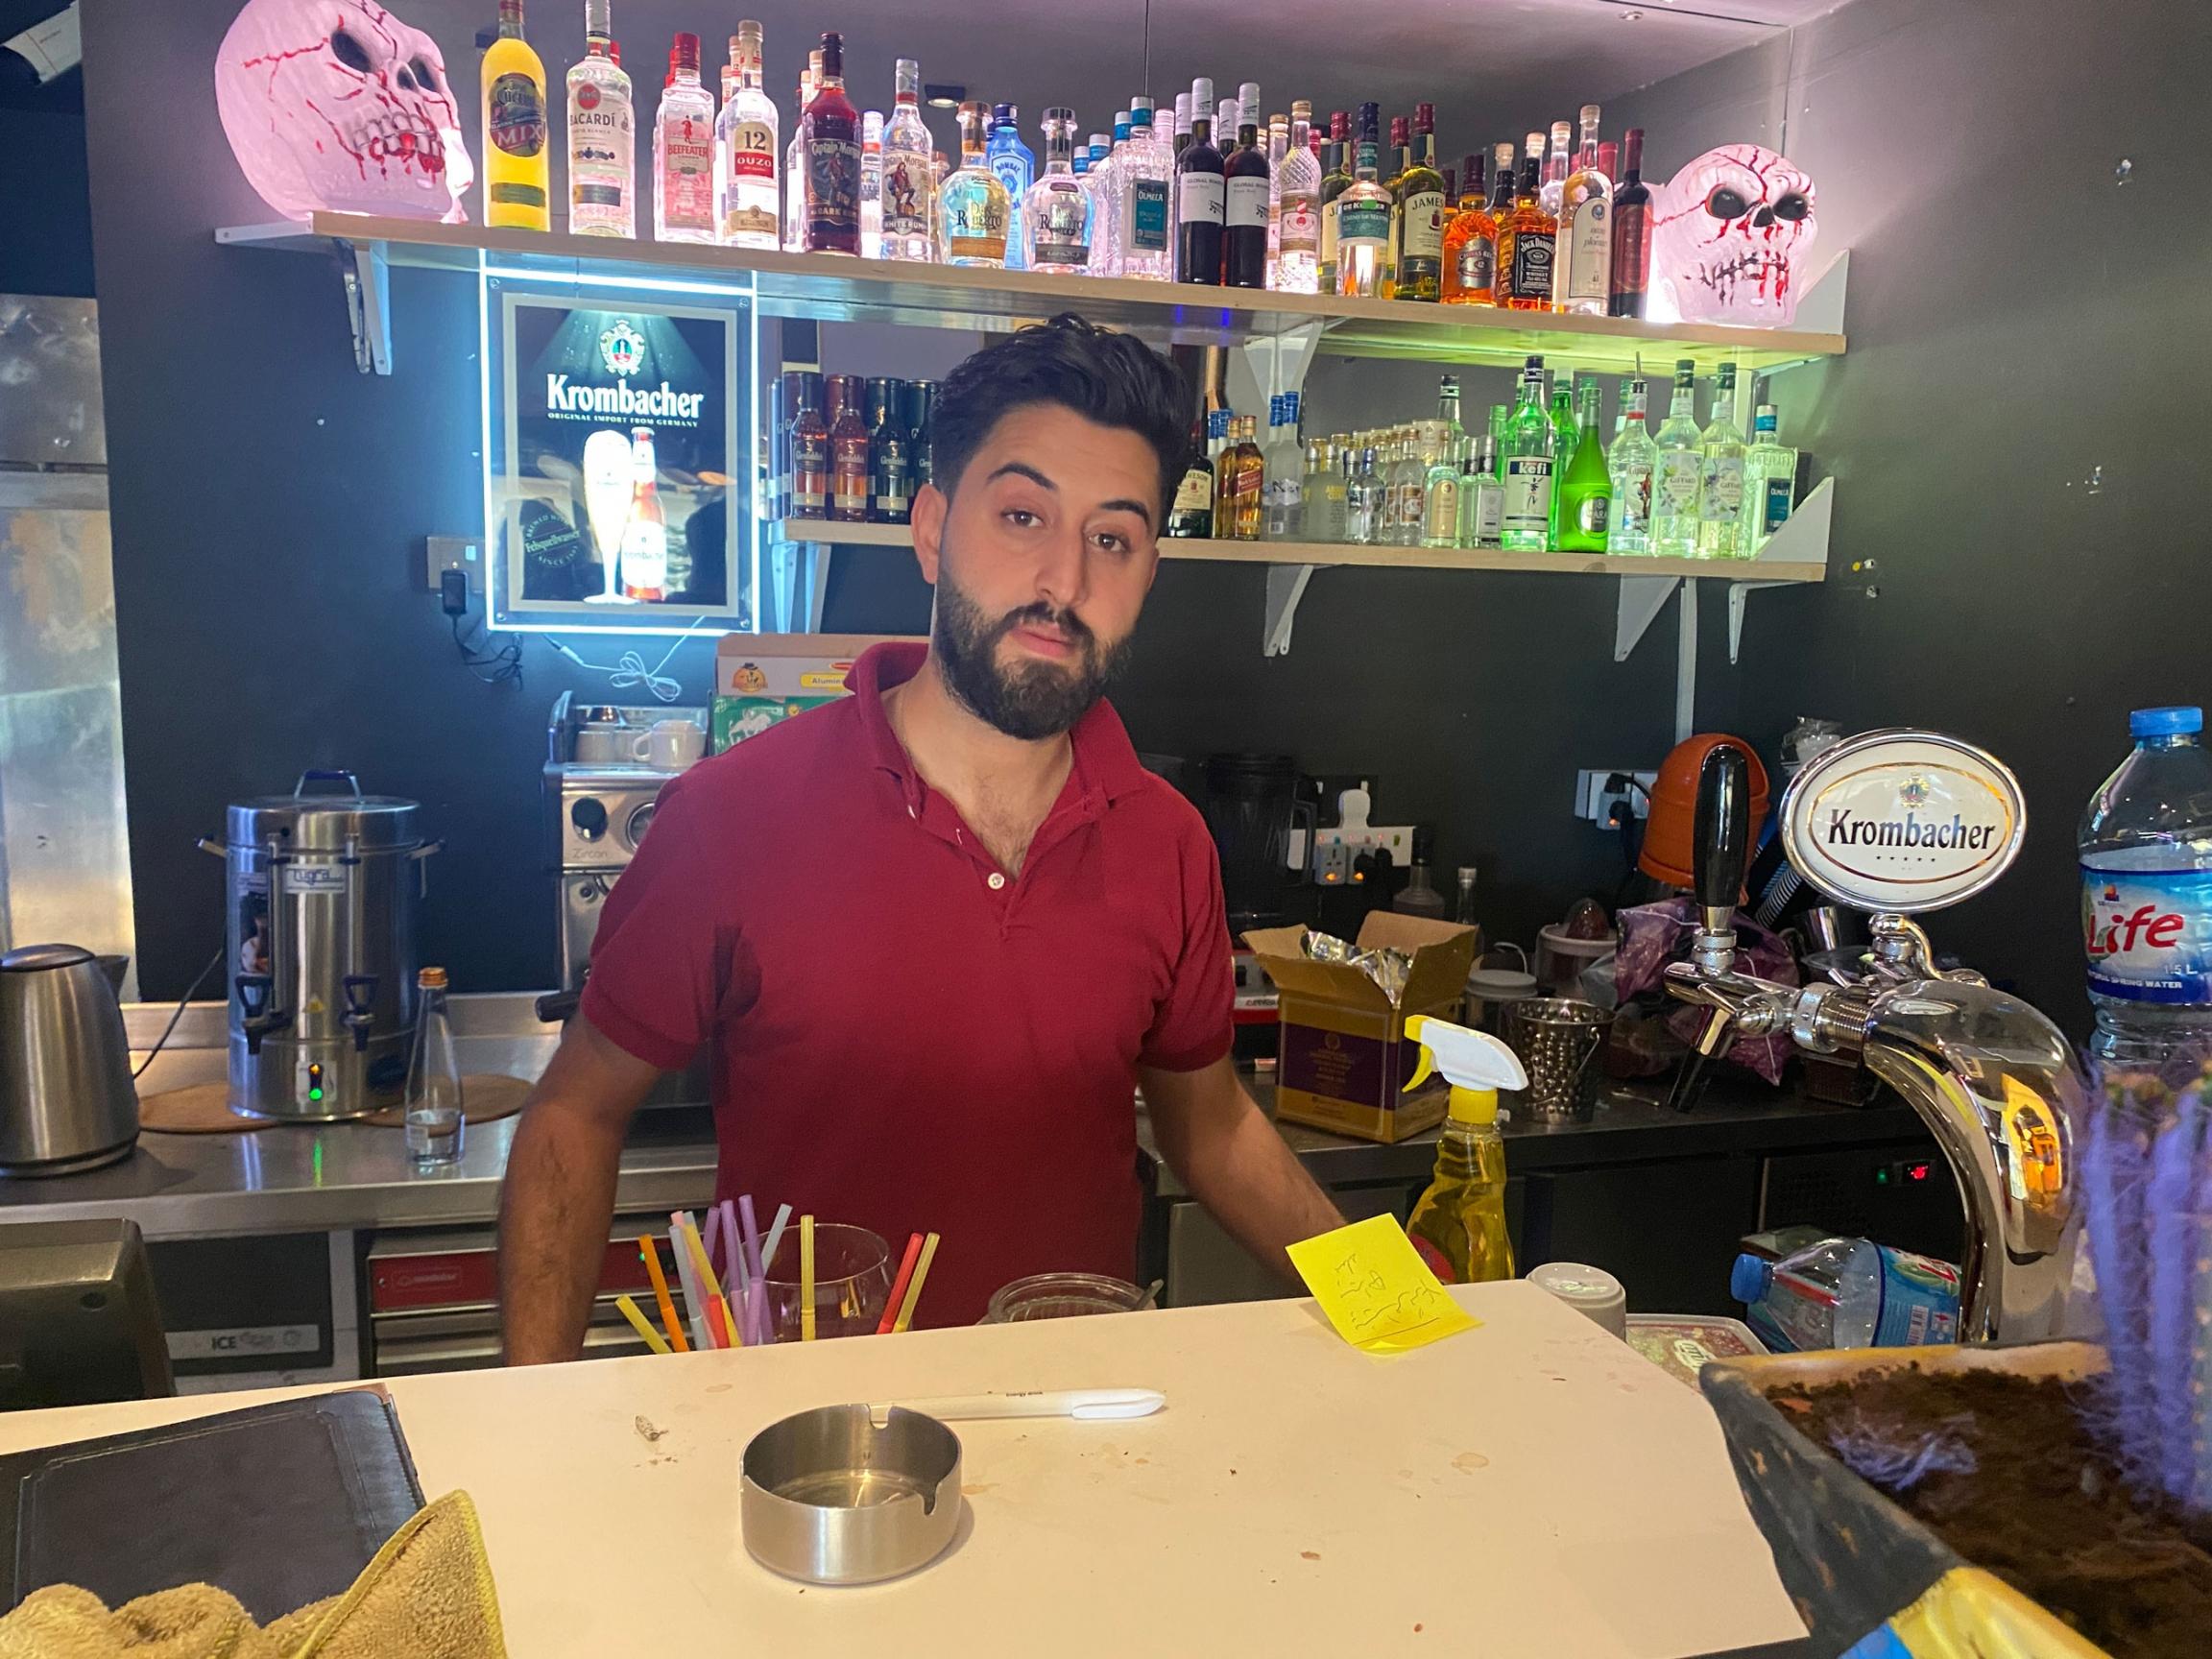 Mabast Zaman is a waiter wearing a red shirt behind a bar at Senorita TexMex restaurant, Erbil, Iraq.